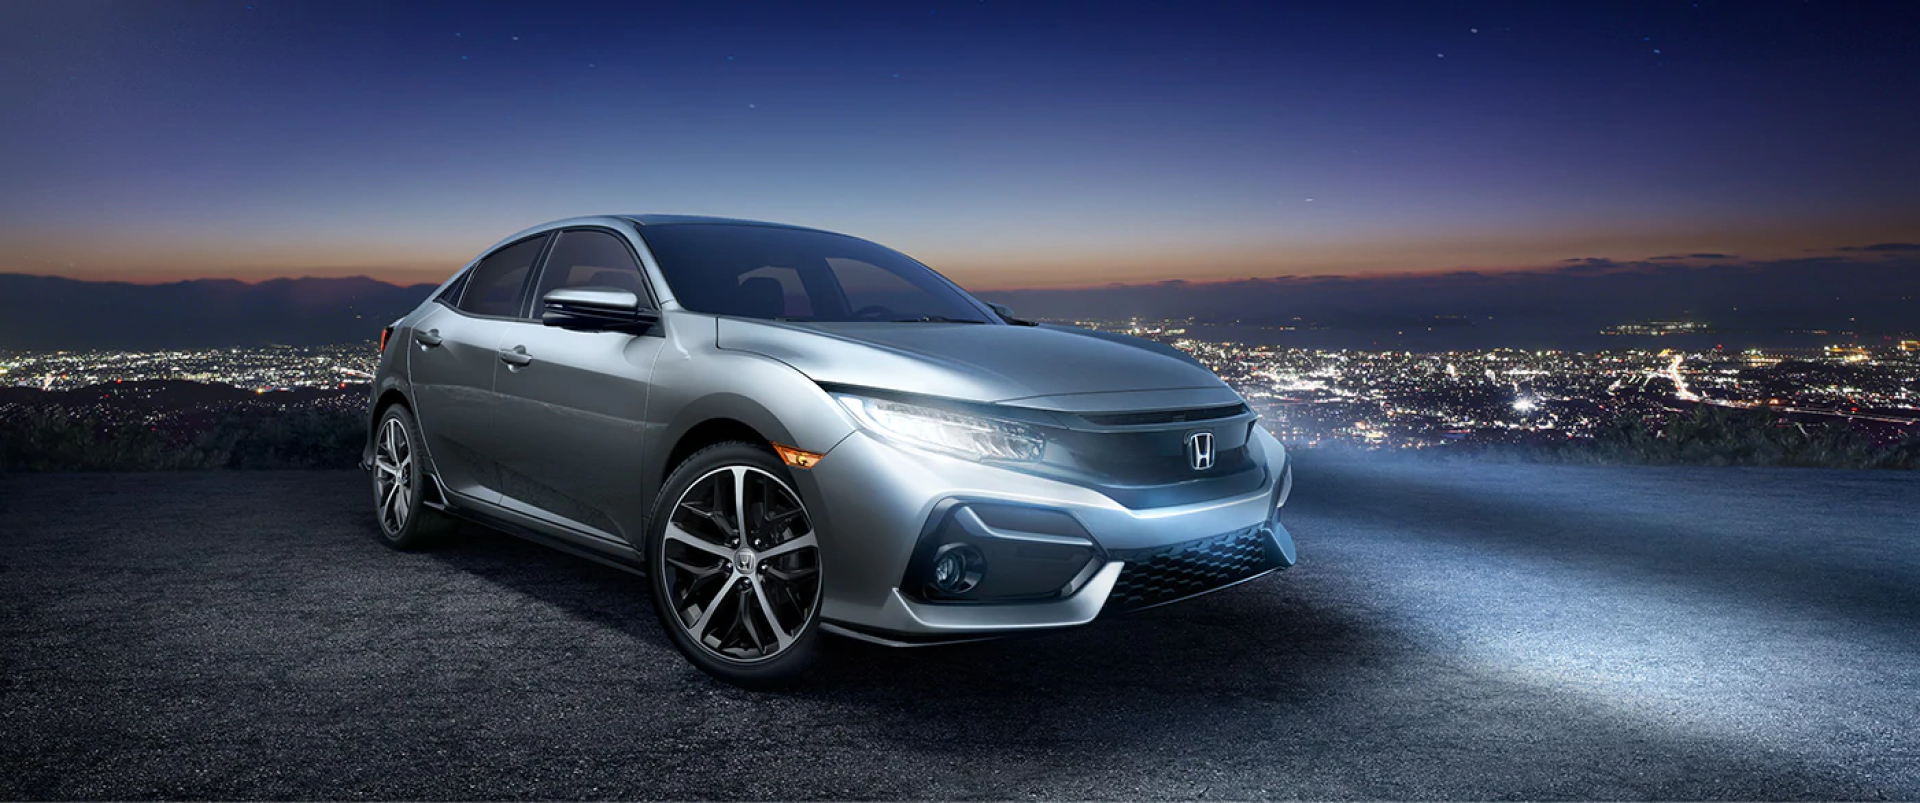 Honda_Civic_Hatchback_Parked_Outside_City